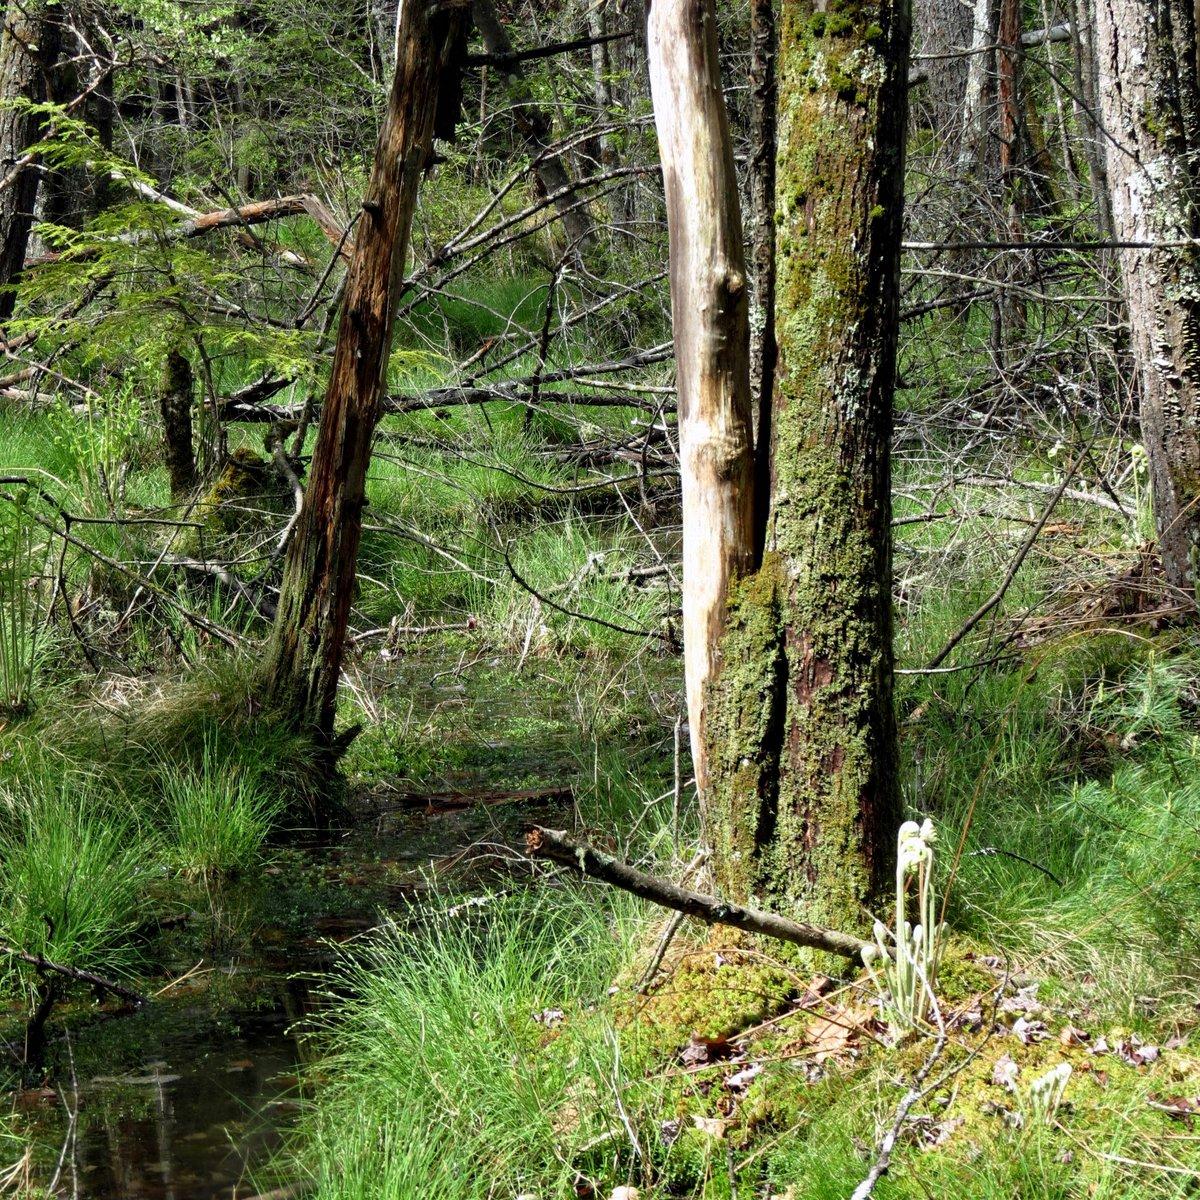 6. Old Beaver Pond